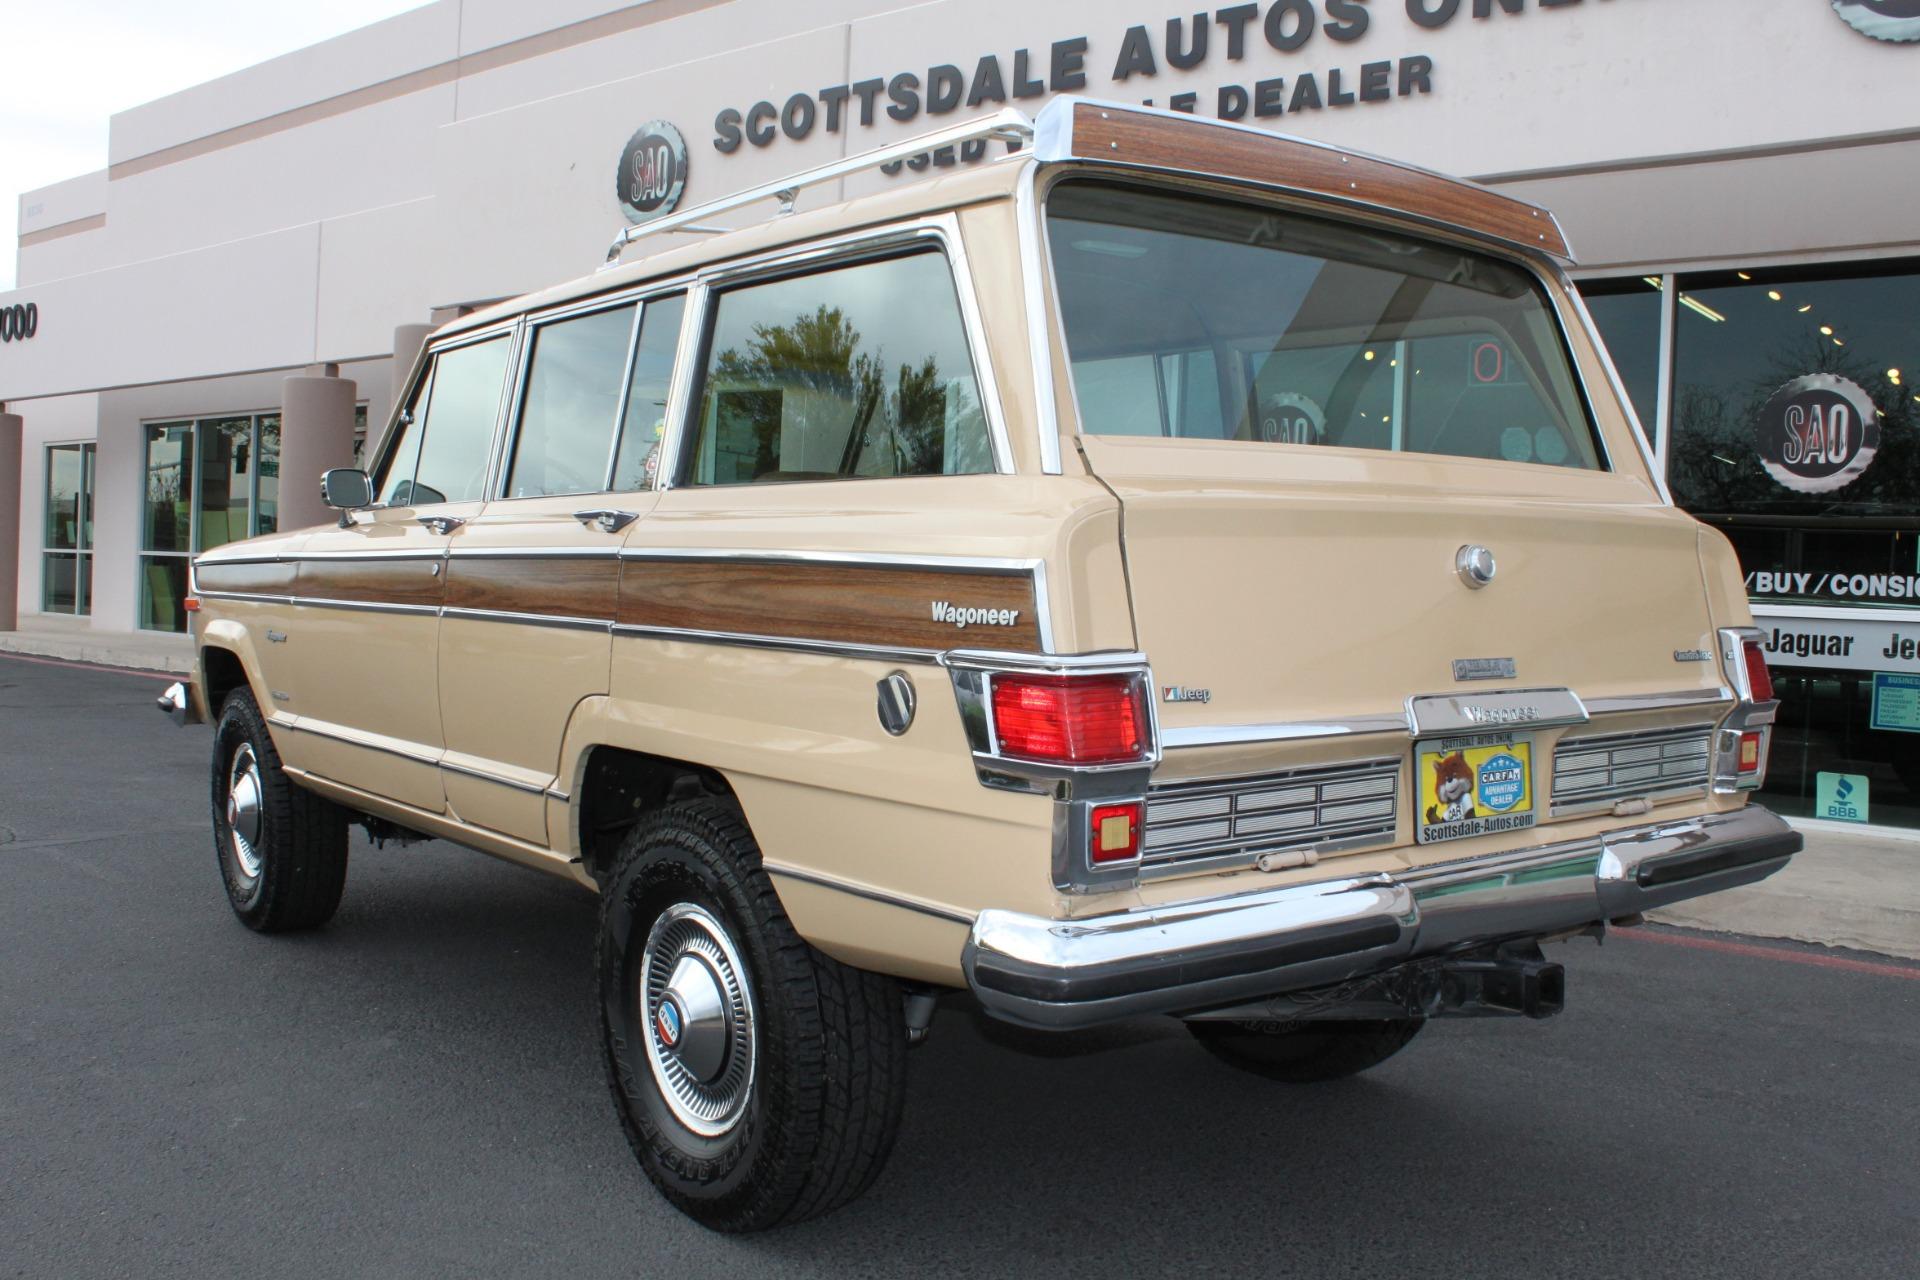 Used-1977-Jeep-Wagoneer-Brougham-Grand-Wagoneer